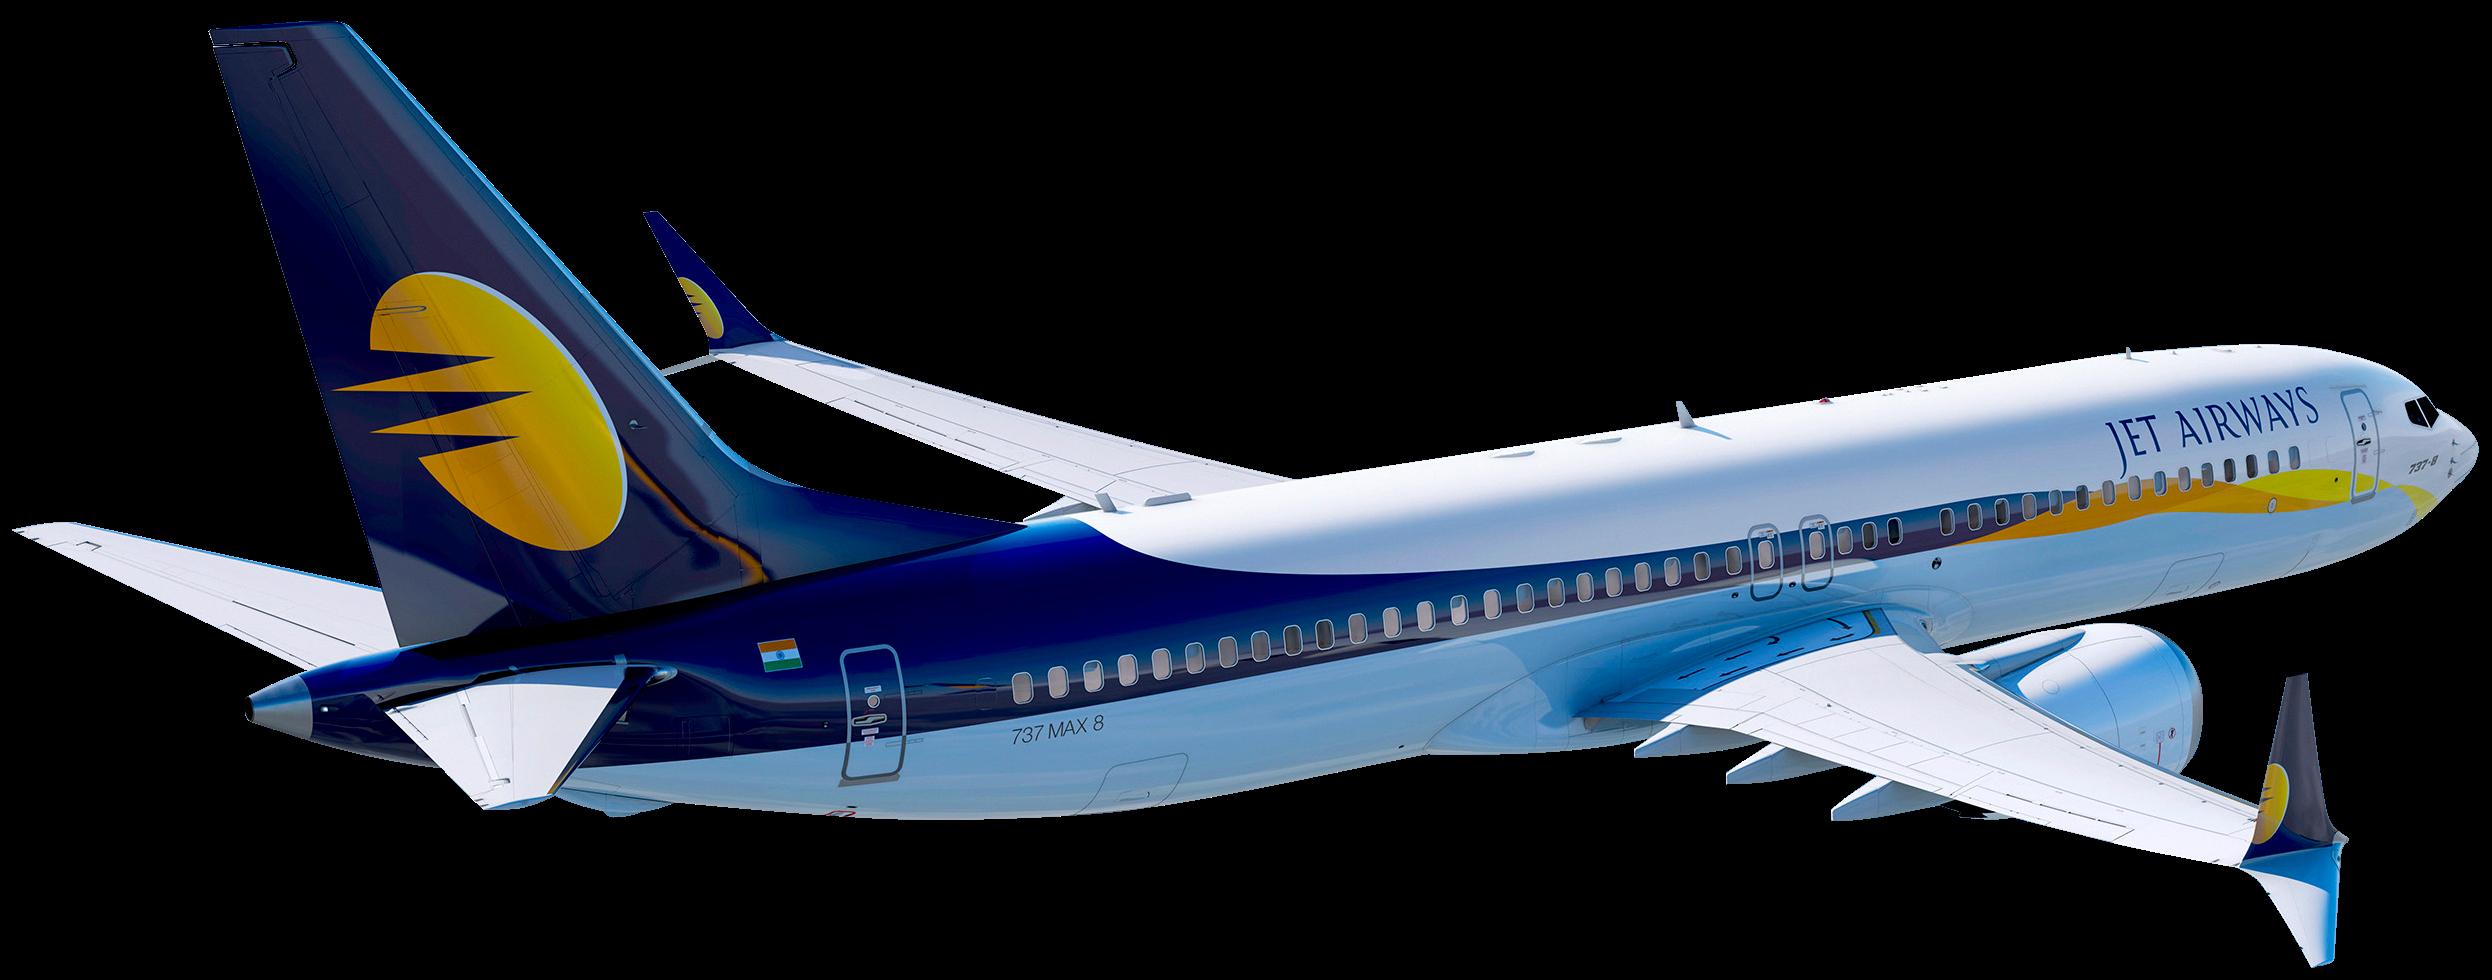 Jet Airways propuestas sin esperanza |